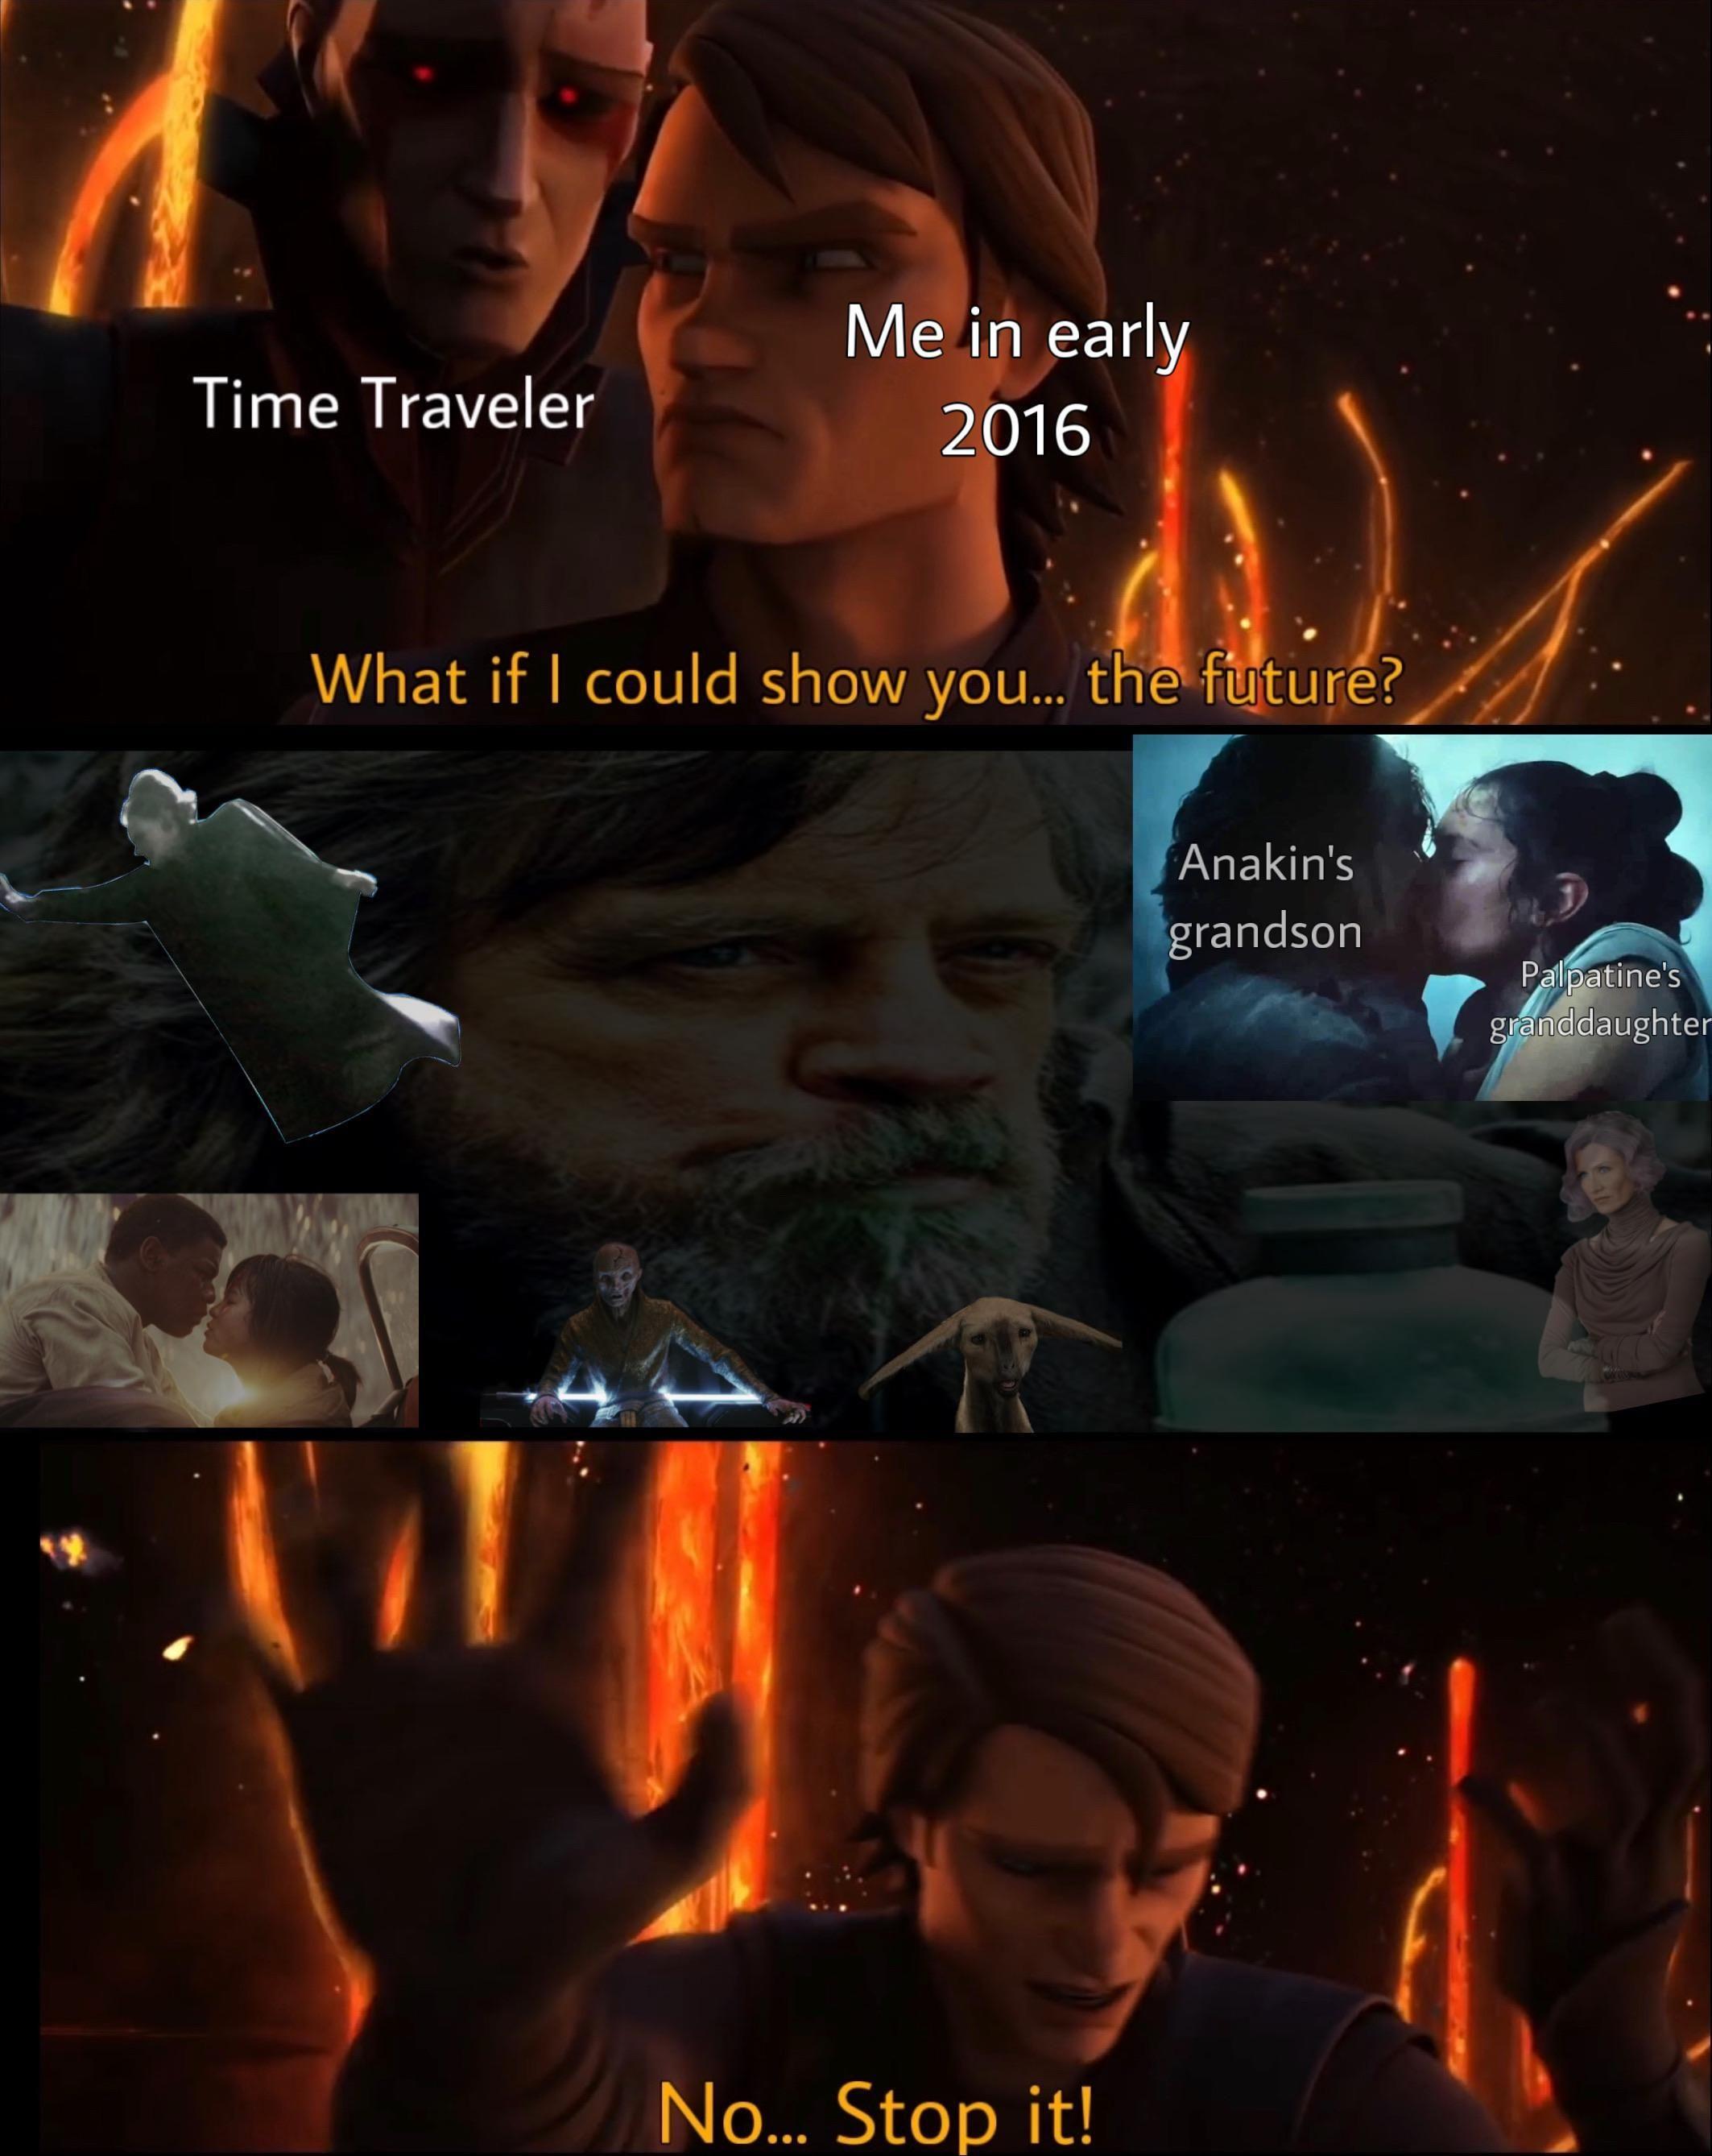 No That S Not True That S Impossible R Prequelmemes Prequel Memes Star Wars Humor Star Wars Jokes Funny Star Wars Memes